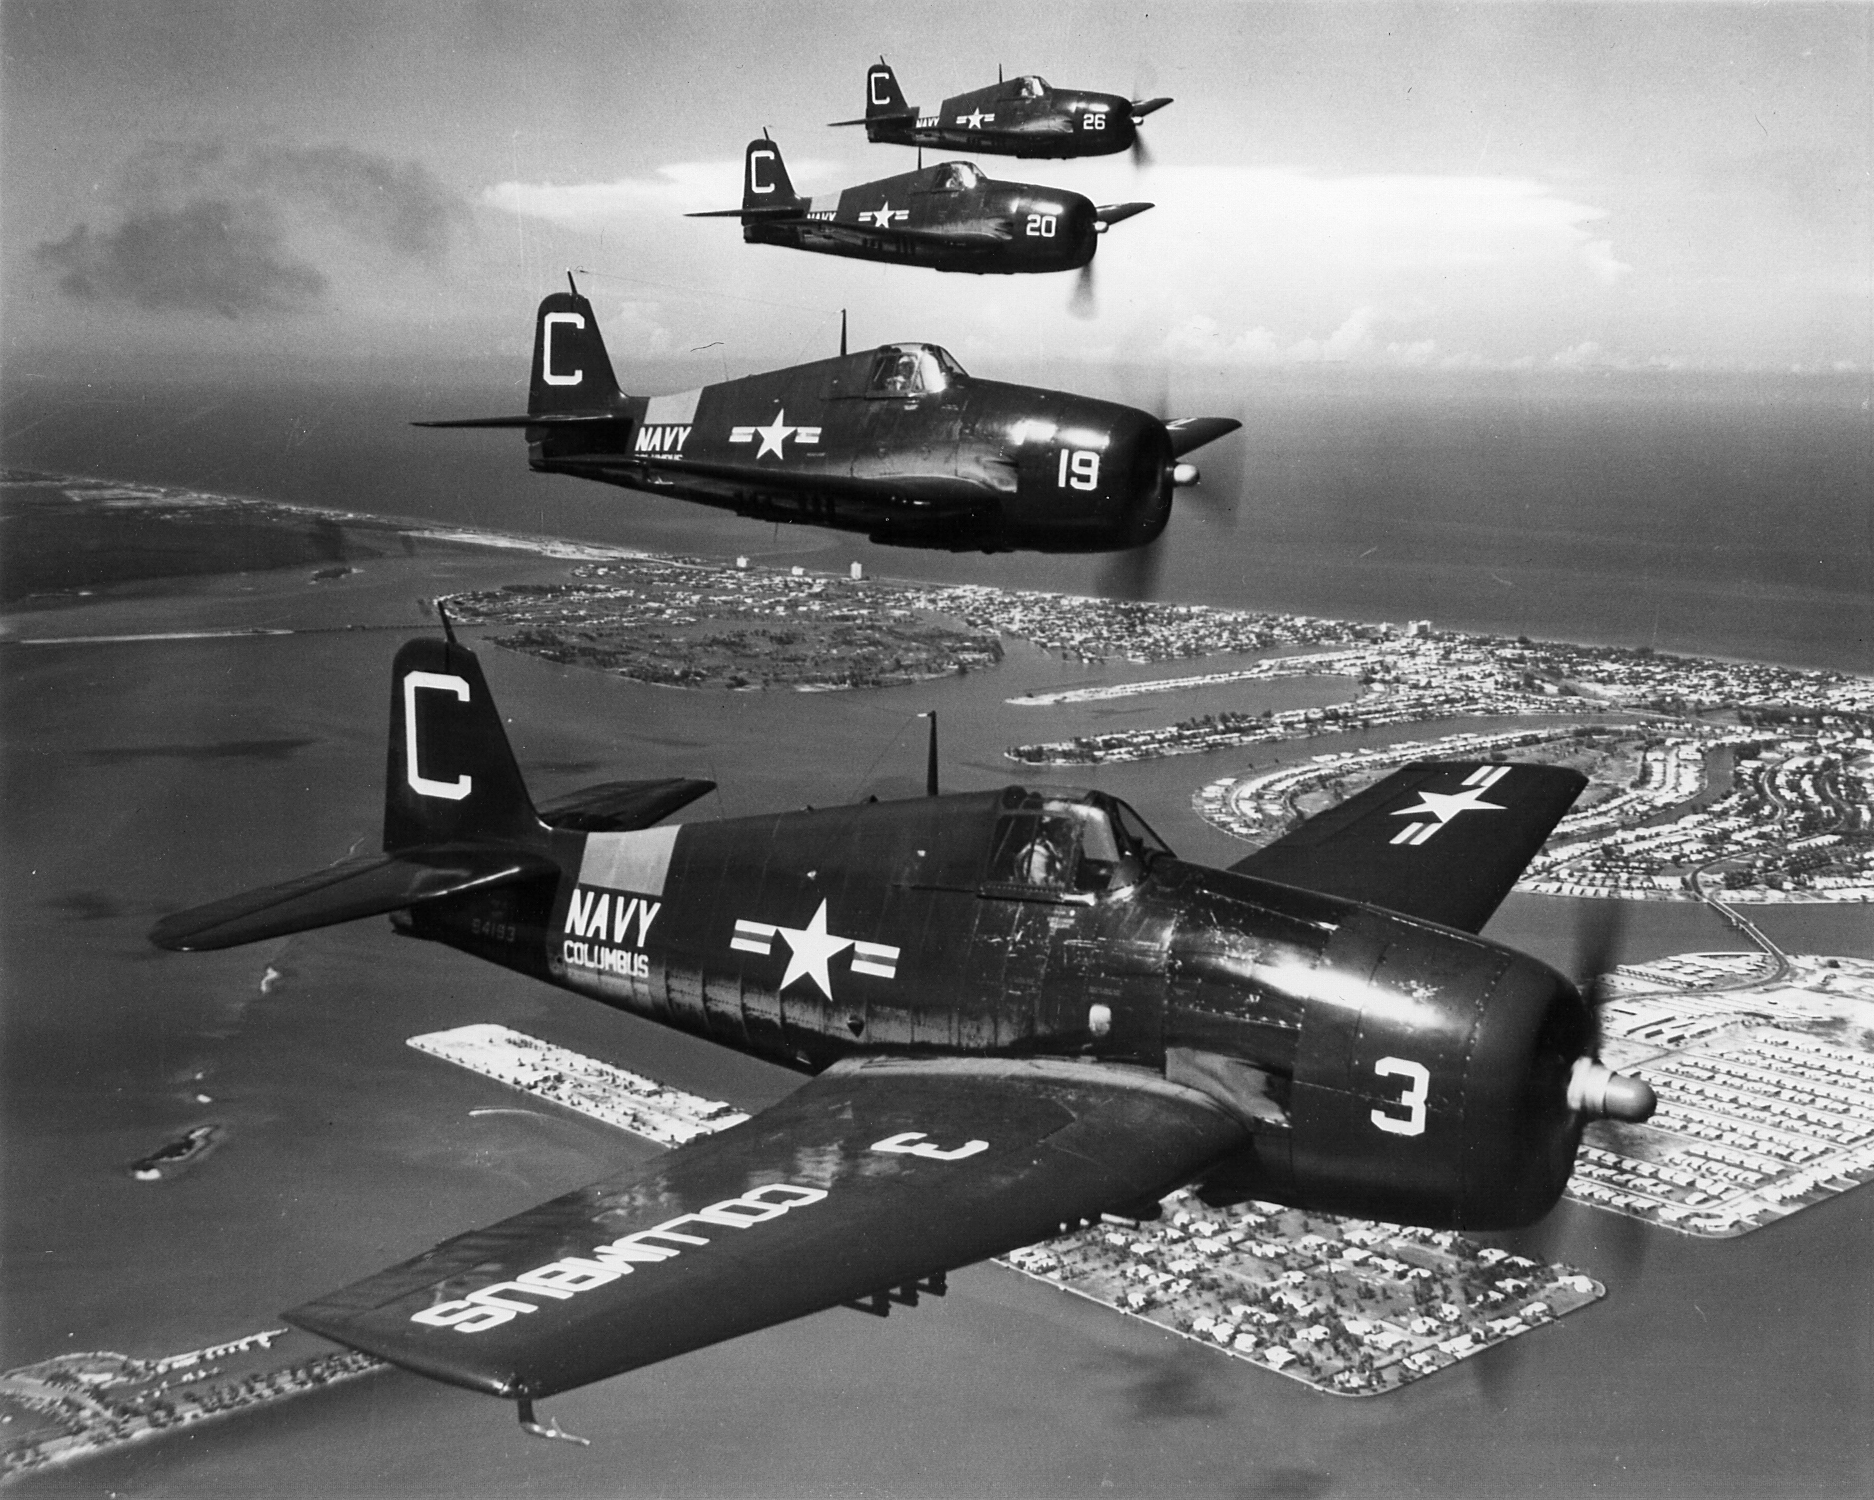 Grumman F6F 5P Hellcat NARTU White C3 BuNo 72386 C19 C20 and C26 over Miami NARTU Columbus OH 1950 01